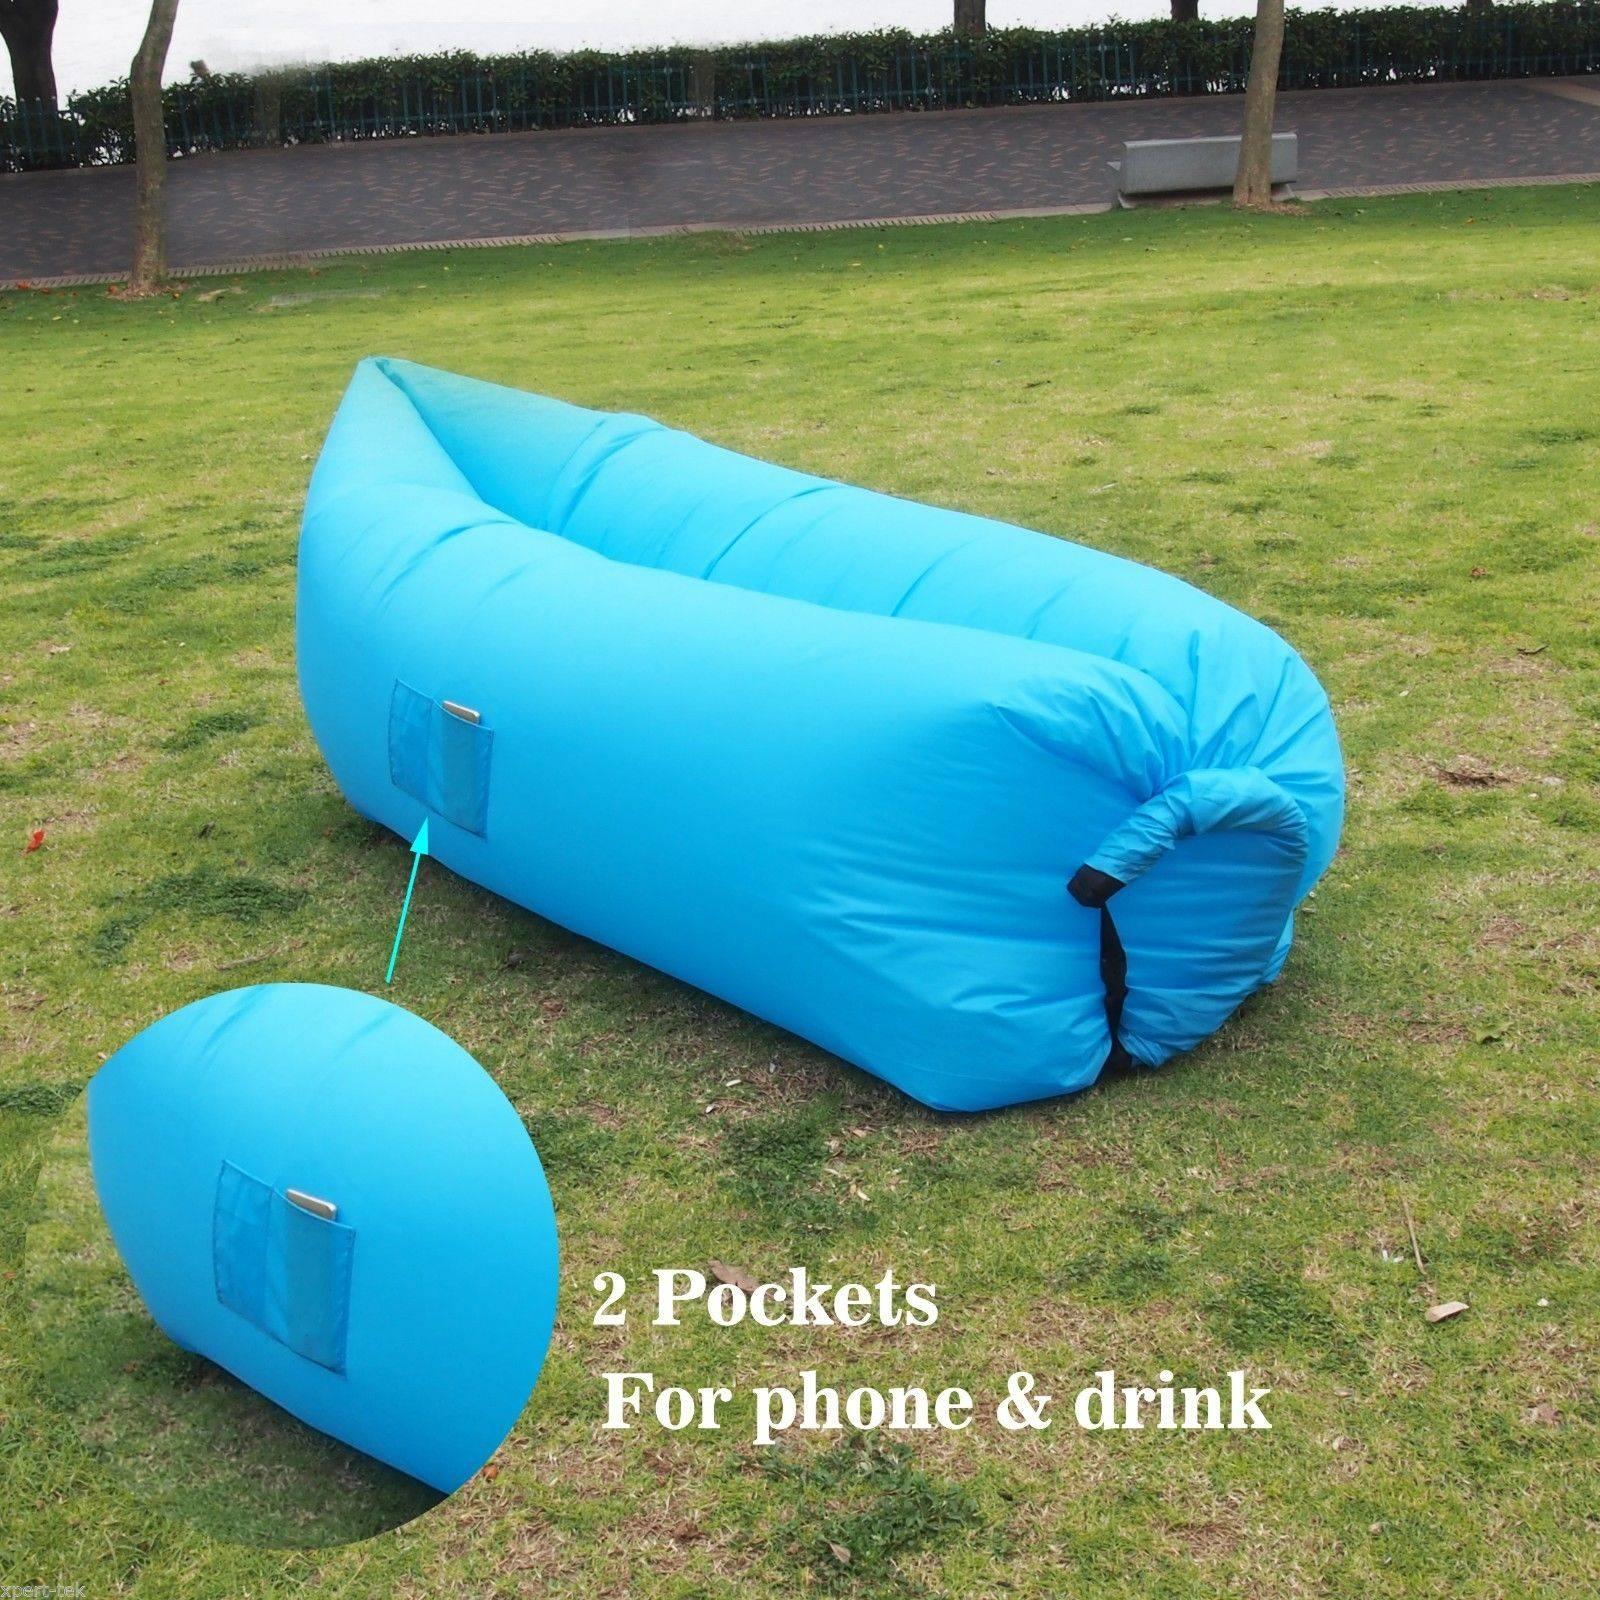 Siesta Inflatable Hangout Air Camping Hiking Sleeping Sofa Bed inside Sleeping Bag Sofas (Image 8 of 15)